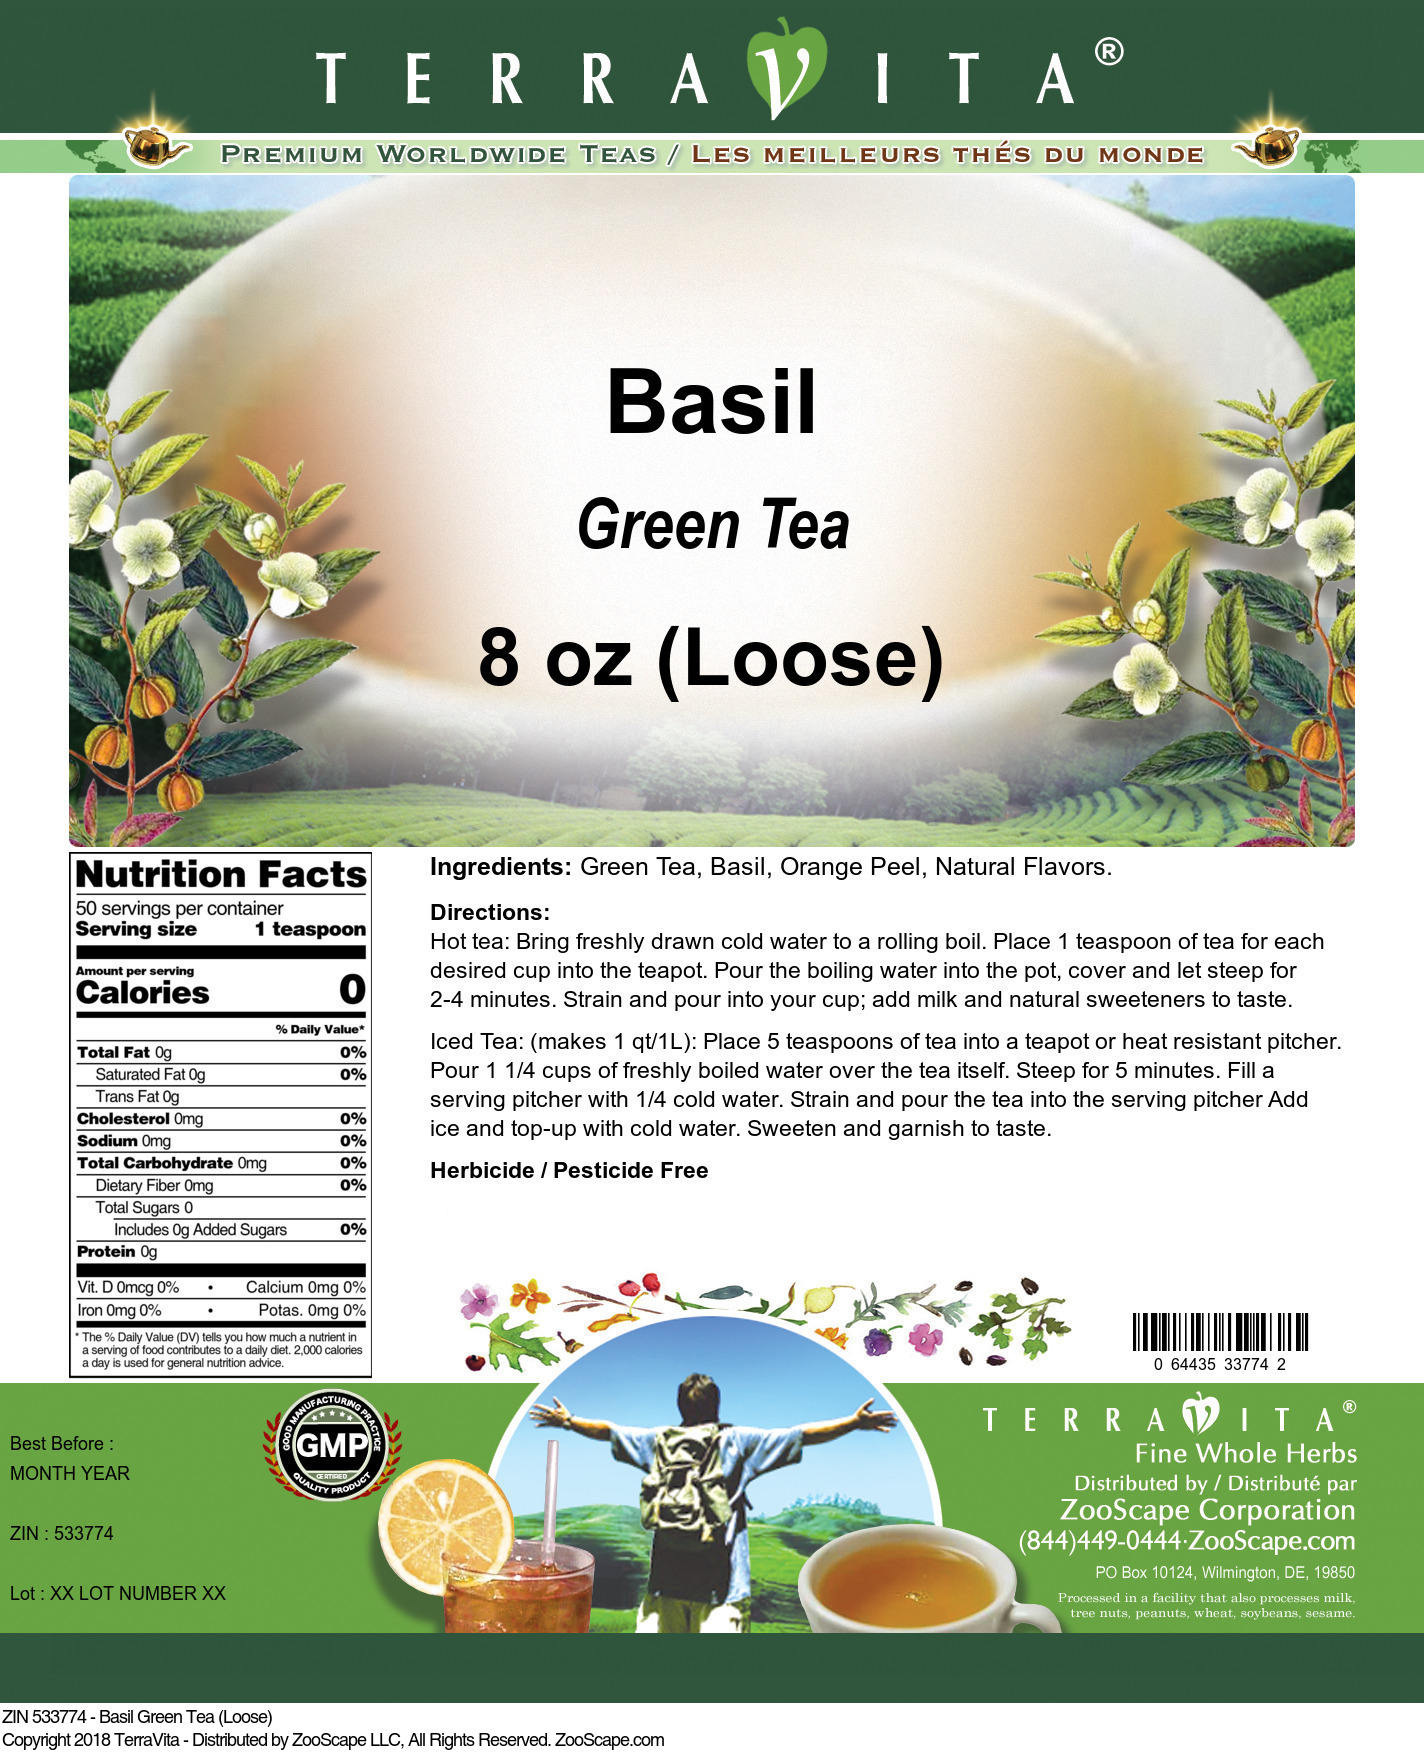 Basil Green Tea